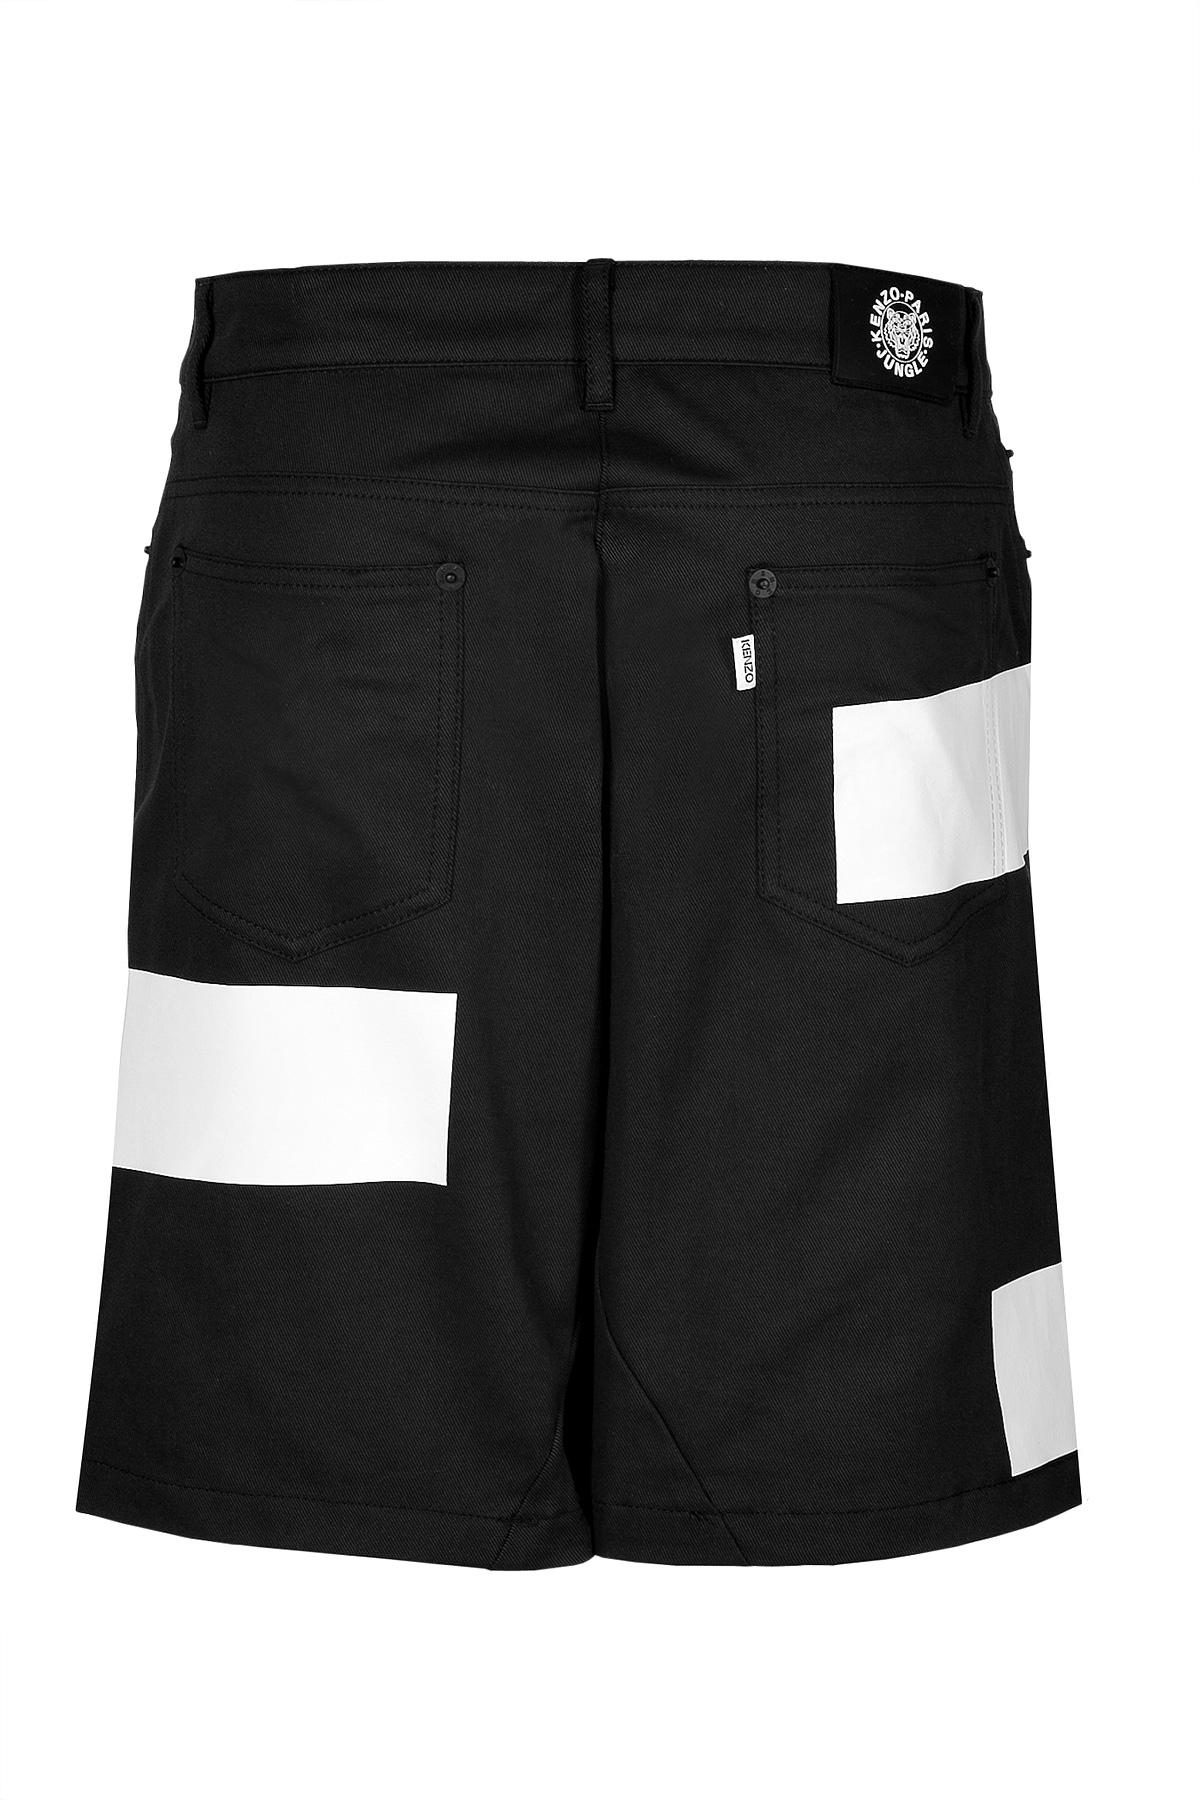 eed9faae54e Lyst - KENZO Colorblock Flared Bermuda Shorts - Black in Black